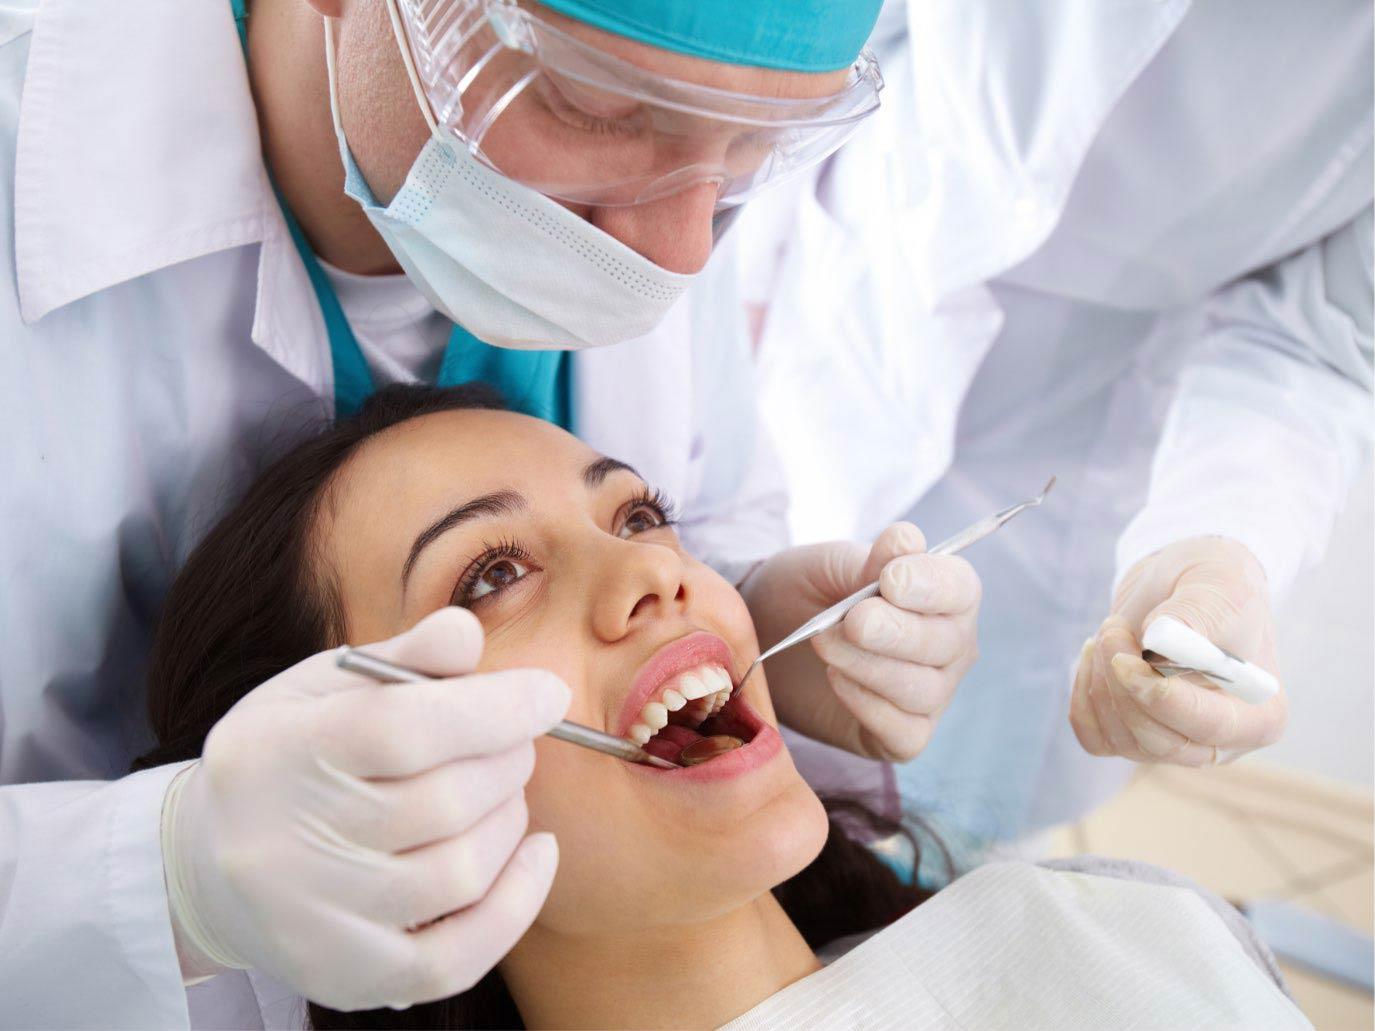 Eccellenze - Dott.ssa Rosita Pascale | RP Odontoiatria | Dentista Castel San Giovanni